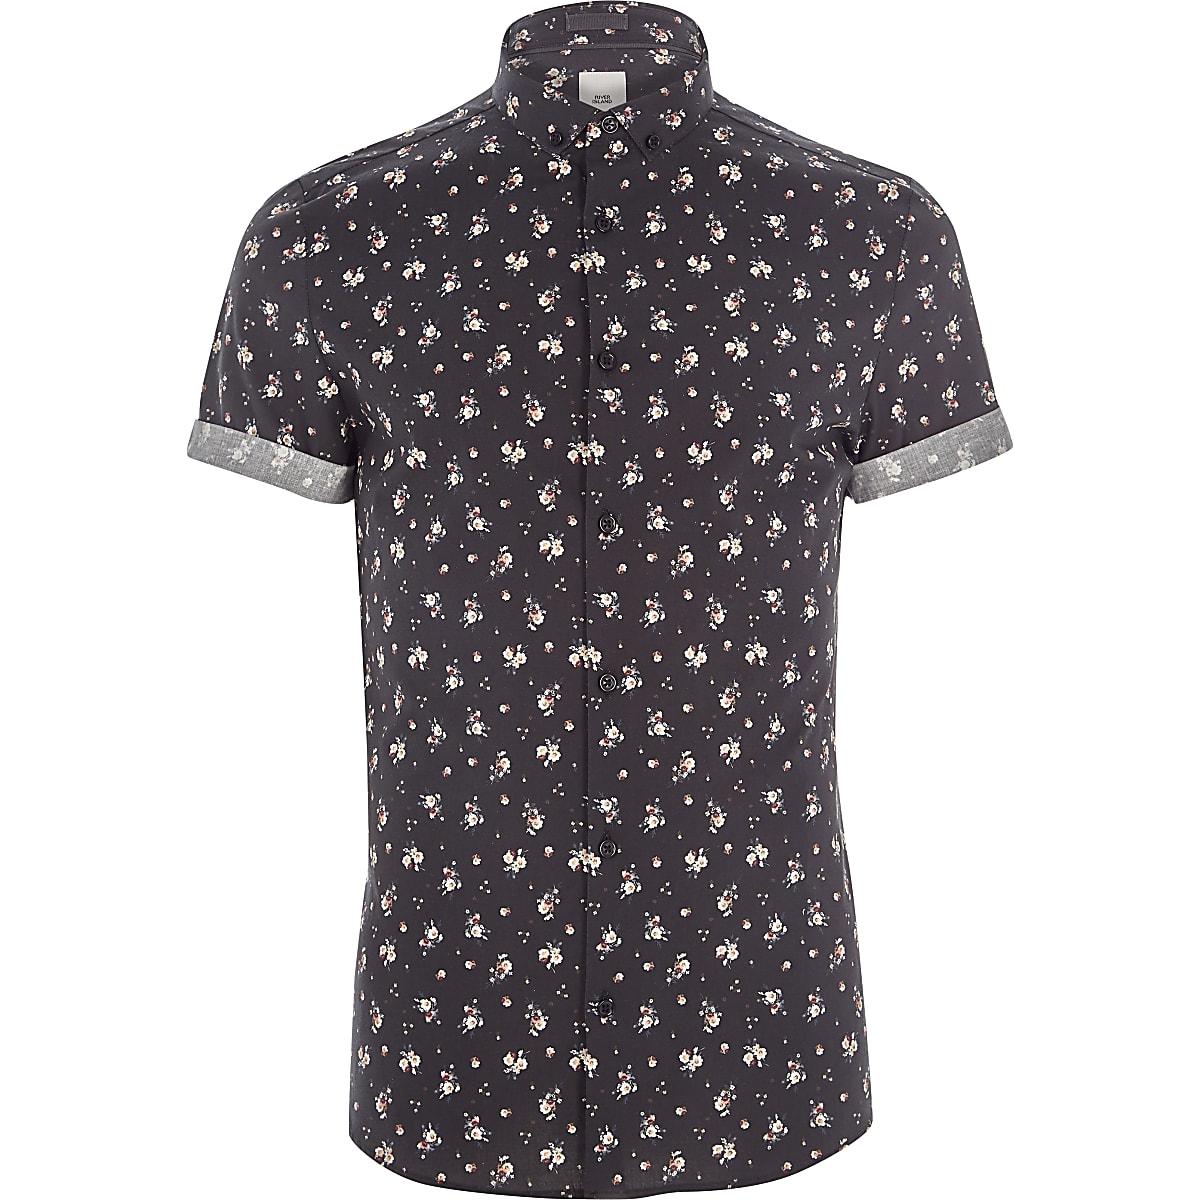 Black ditsy floral print skinny fit shirt